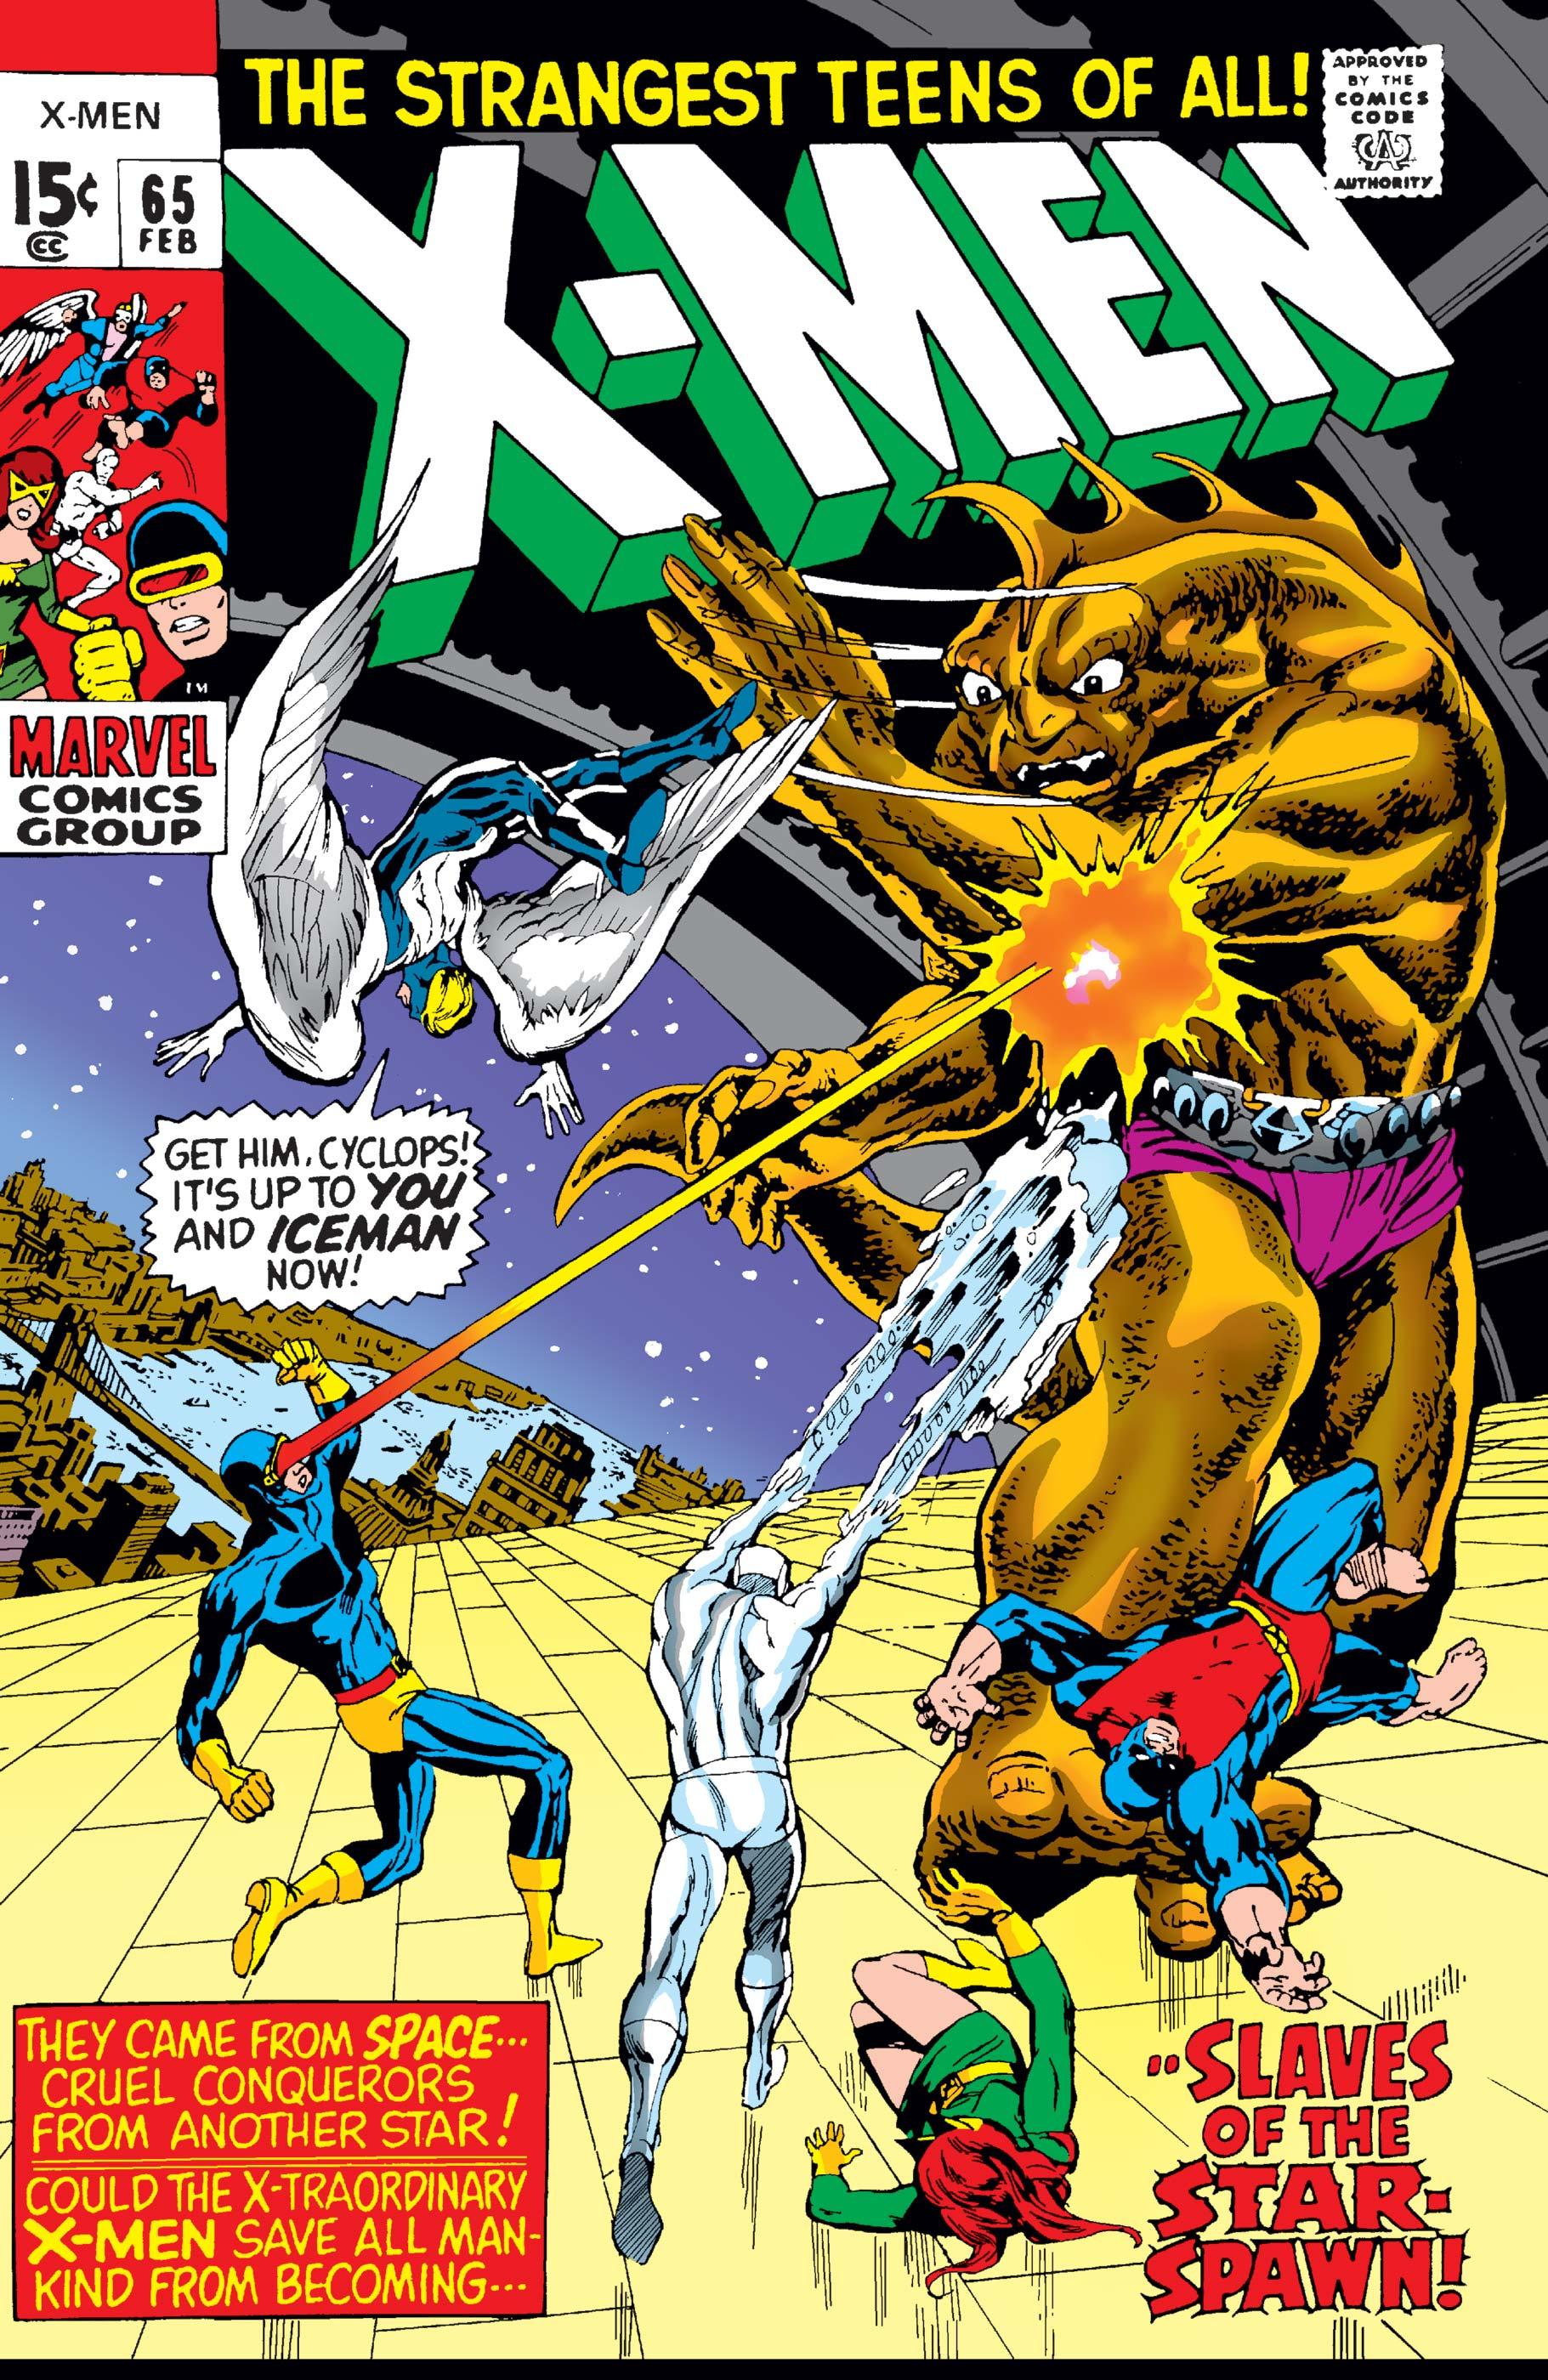 Uncanny X-Men (1963) #65